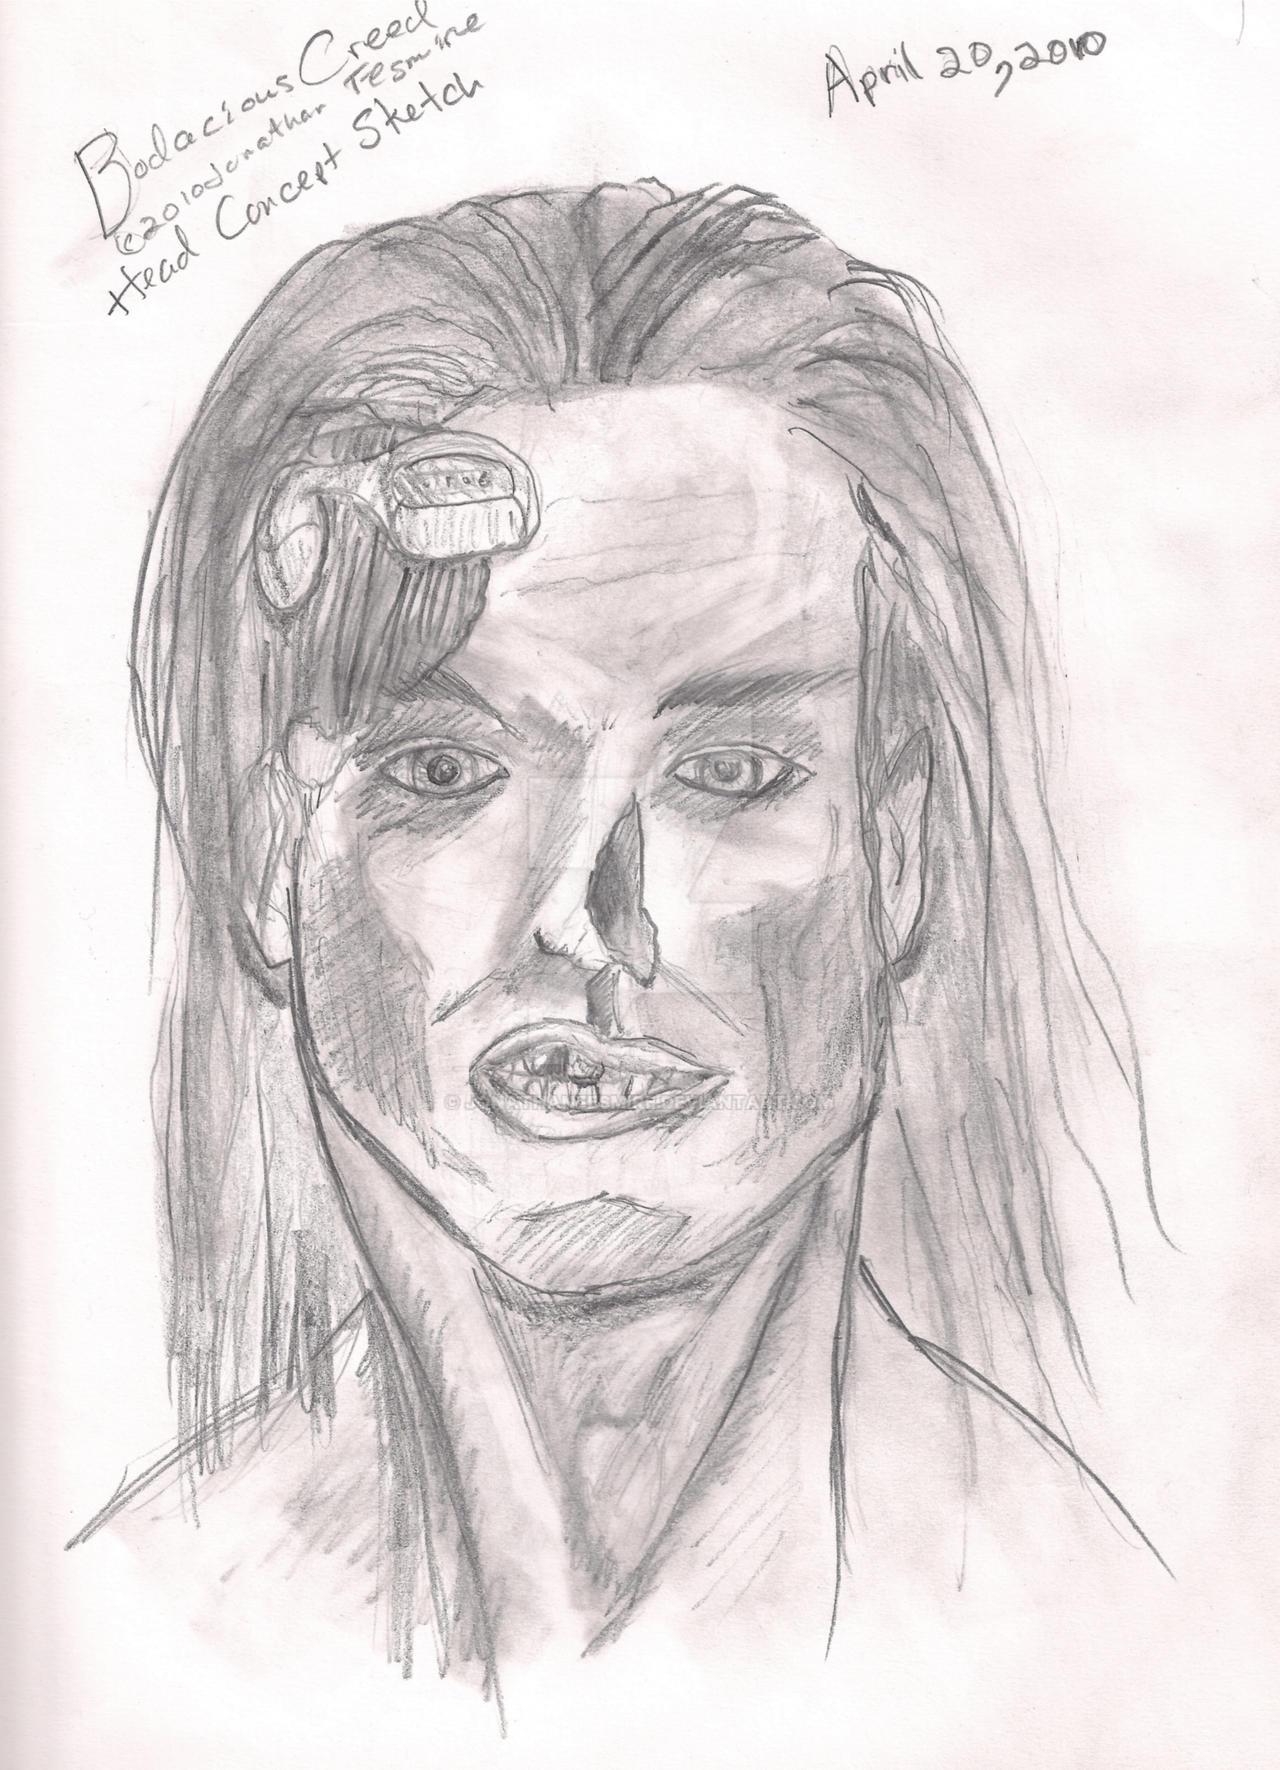 Bodacious Creed Head 01 by JonathanFesmire